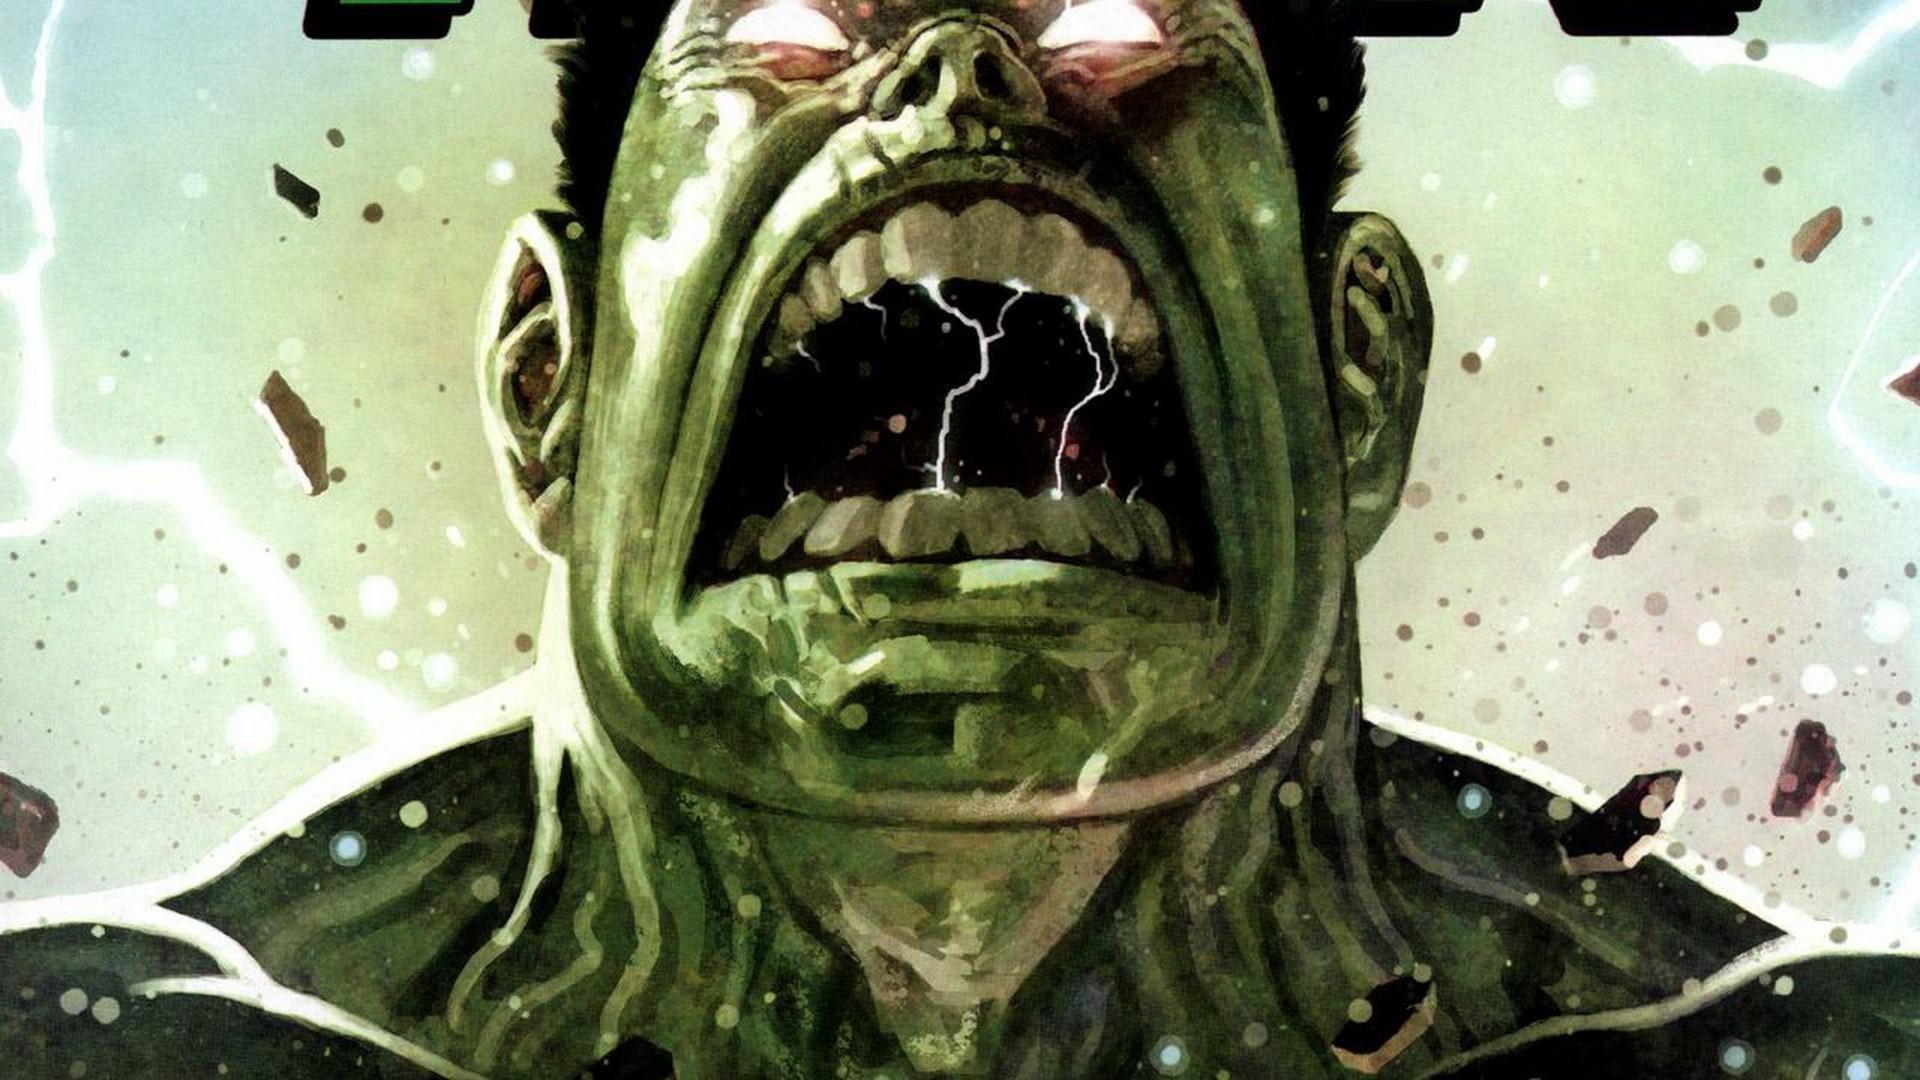 Angry Hulk Wallpapers High Quality